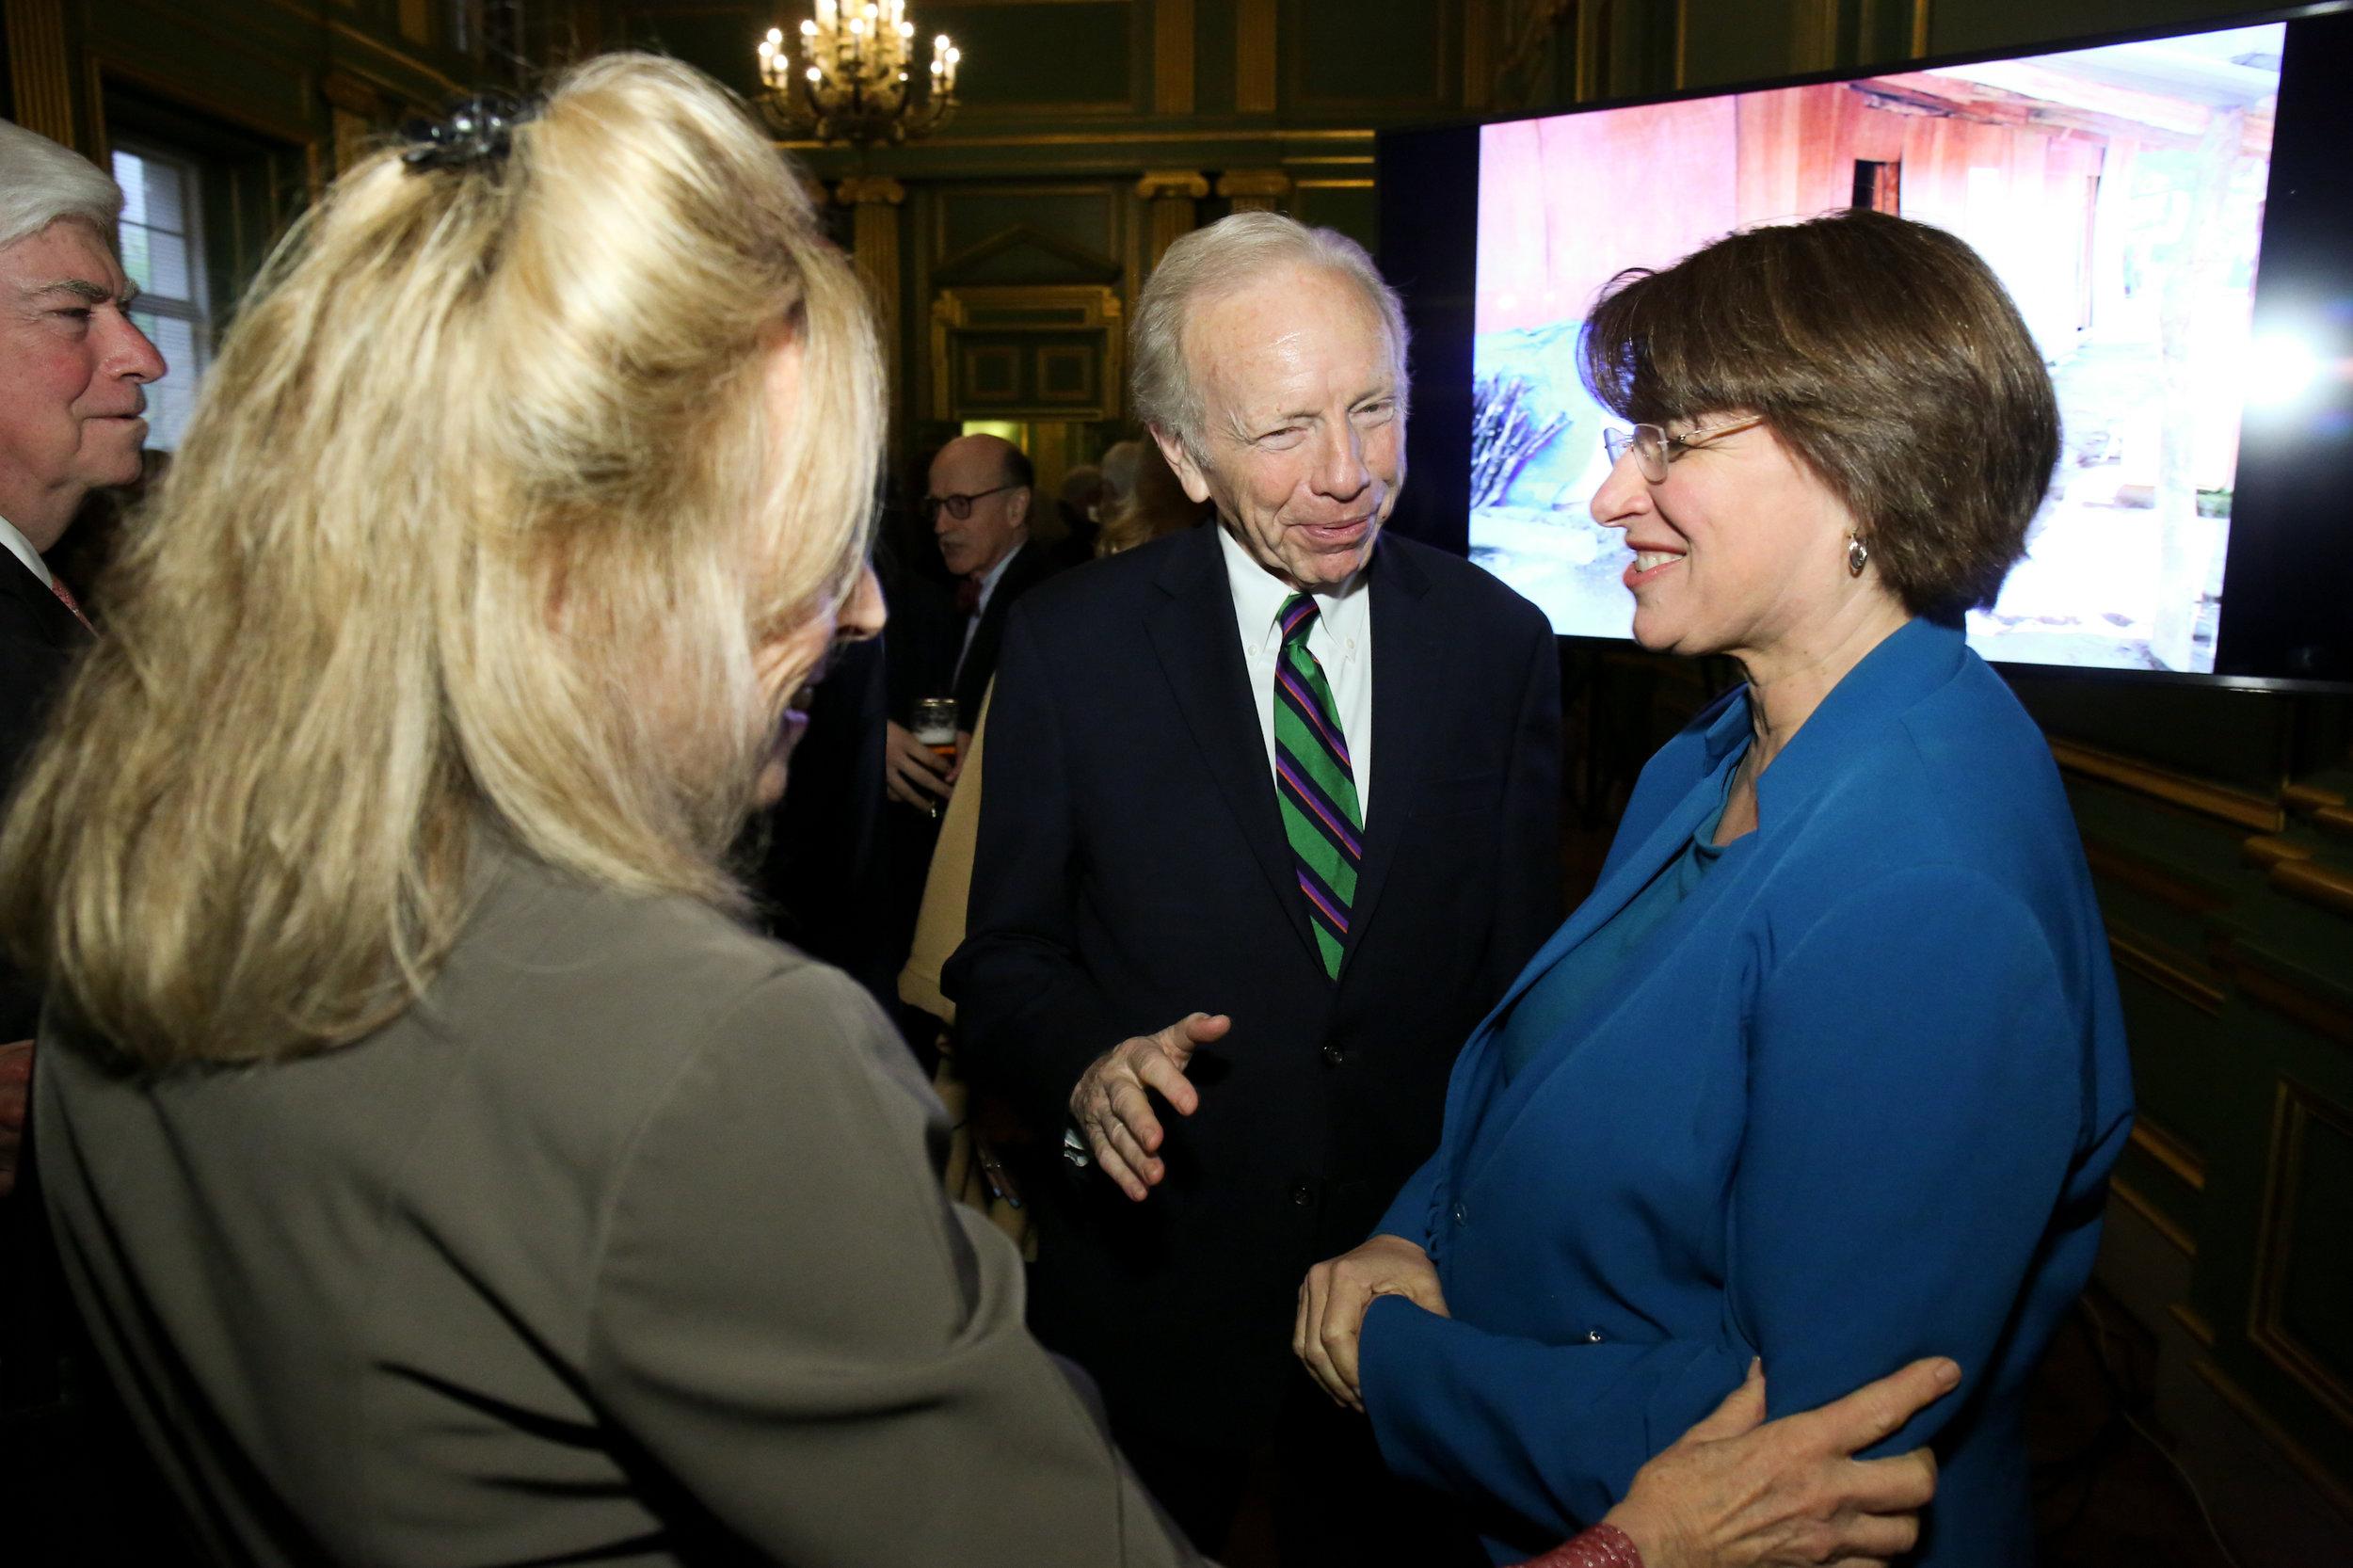 Senator Chris Dodd, Hadassah Lieberman, Senator Joe Lieberman, and Senator Amy Klobuchar